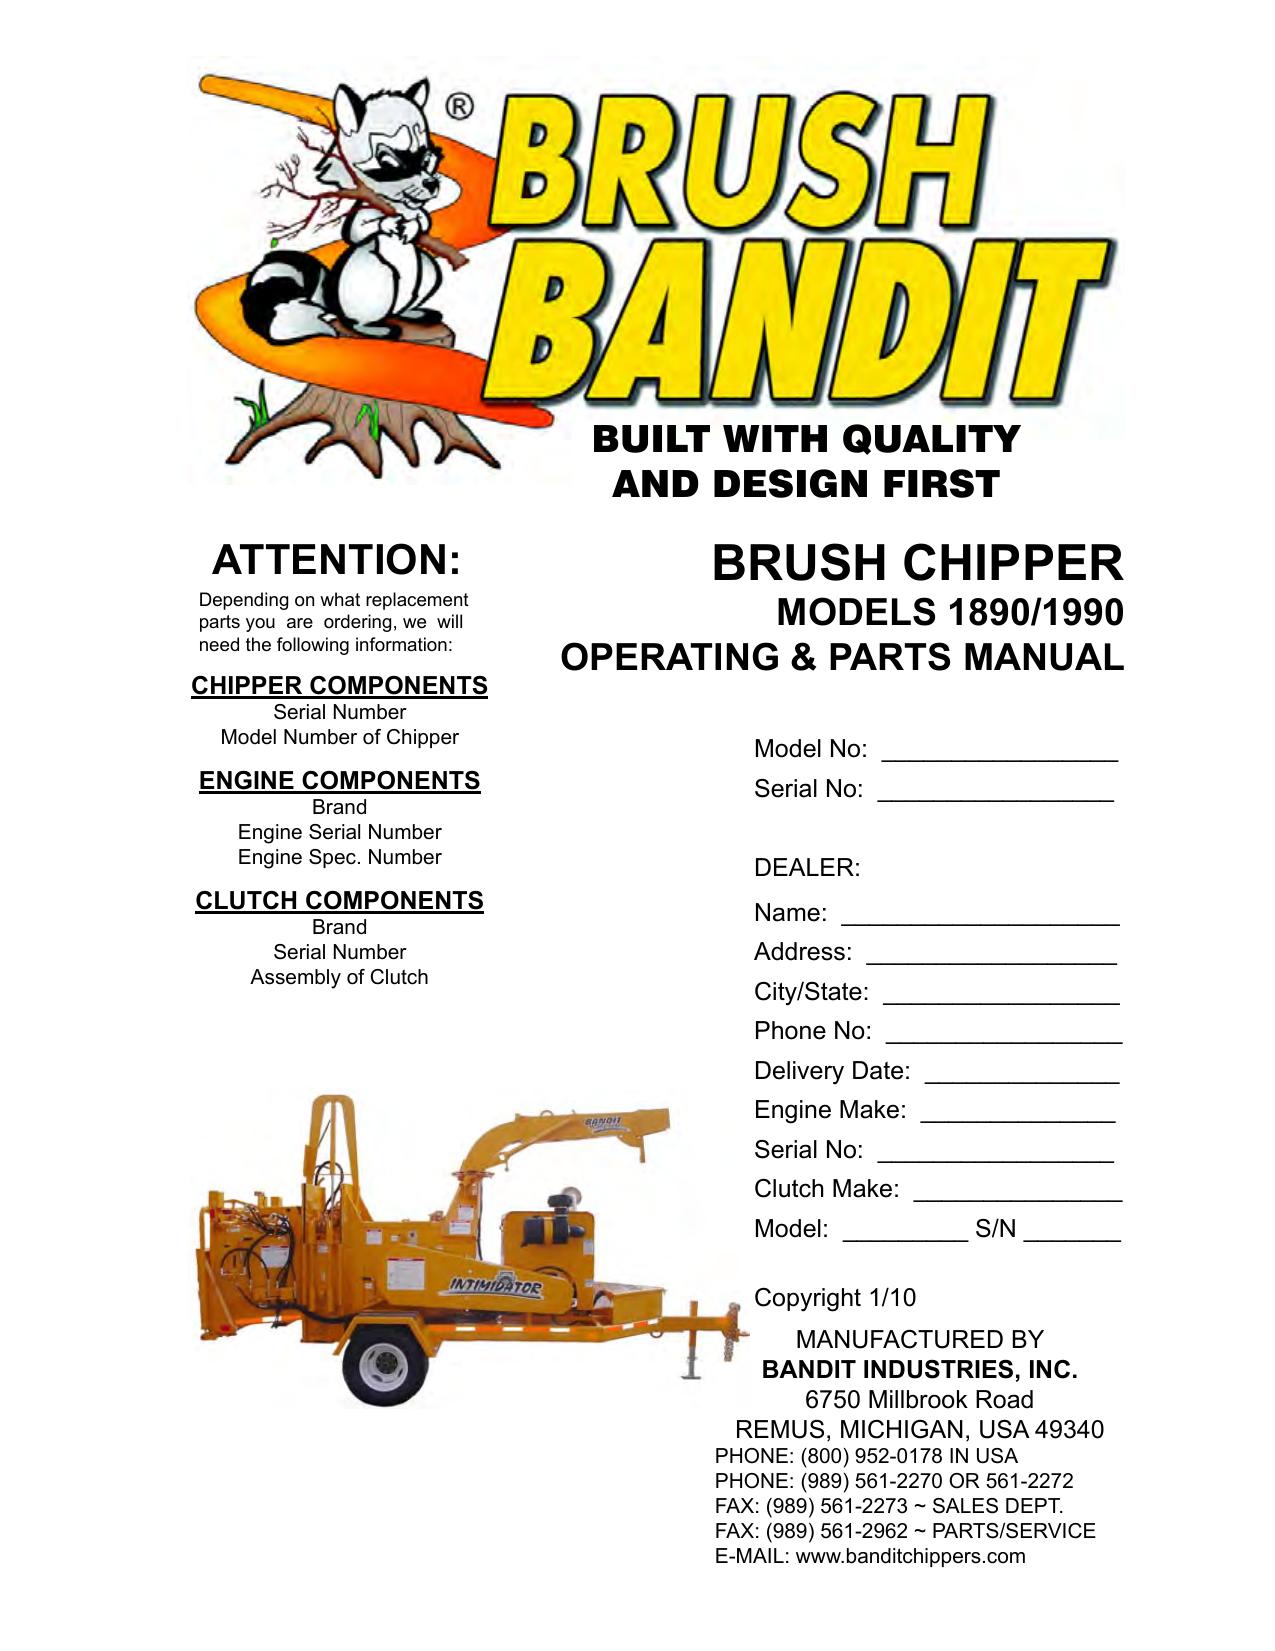 brush chipper stephenson equipment manualzz com rh manualzz com Brush  Bandit 250Xp Wood Chipper